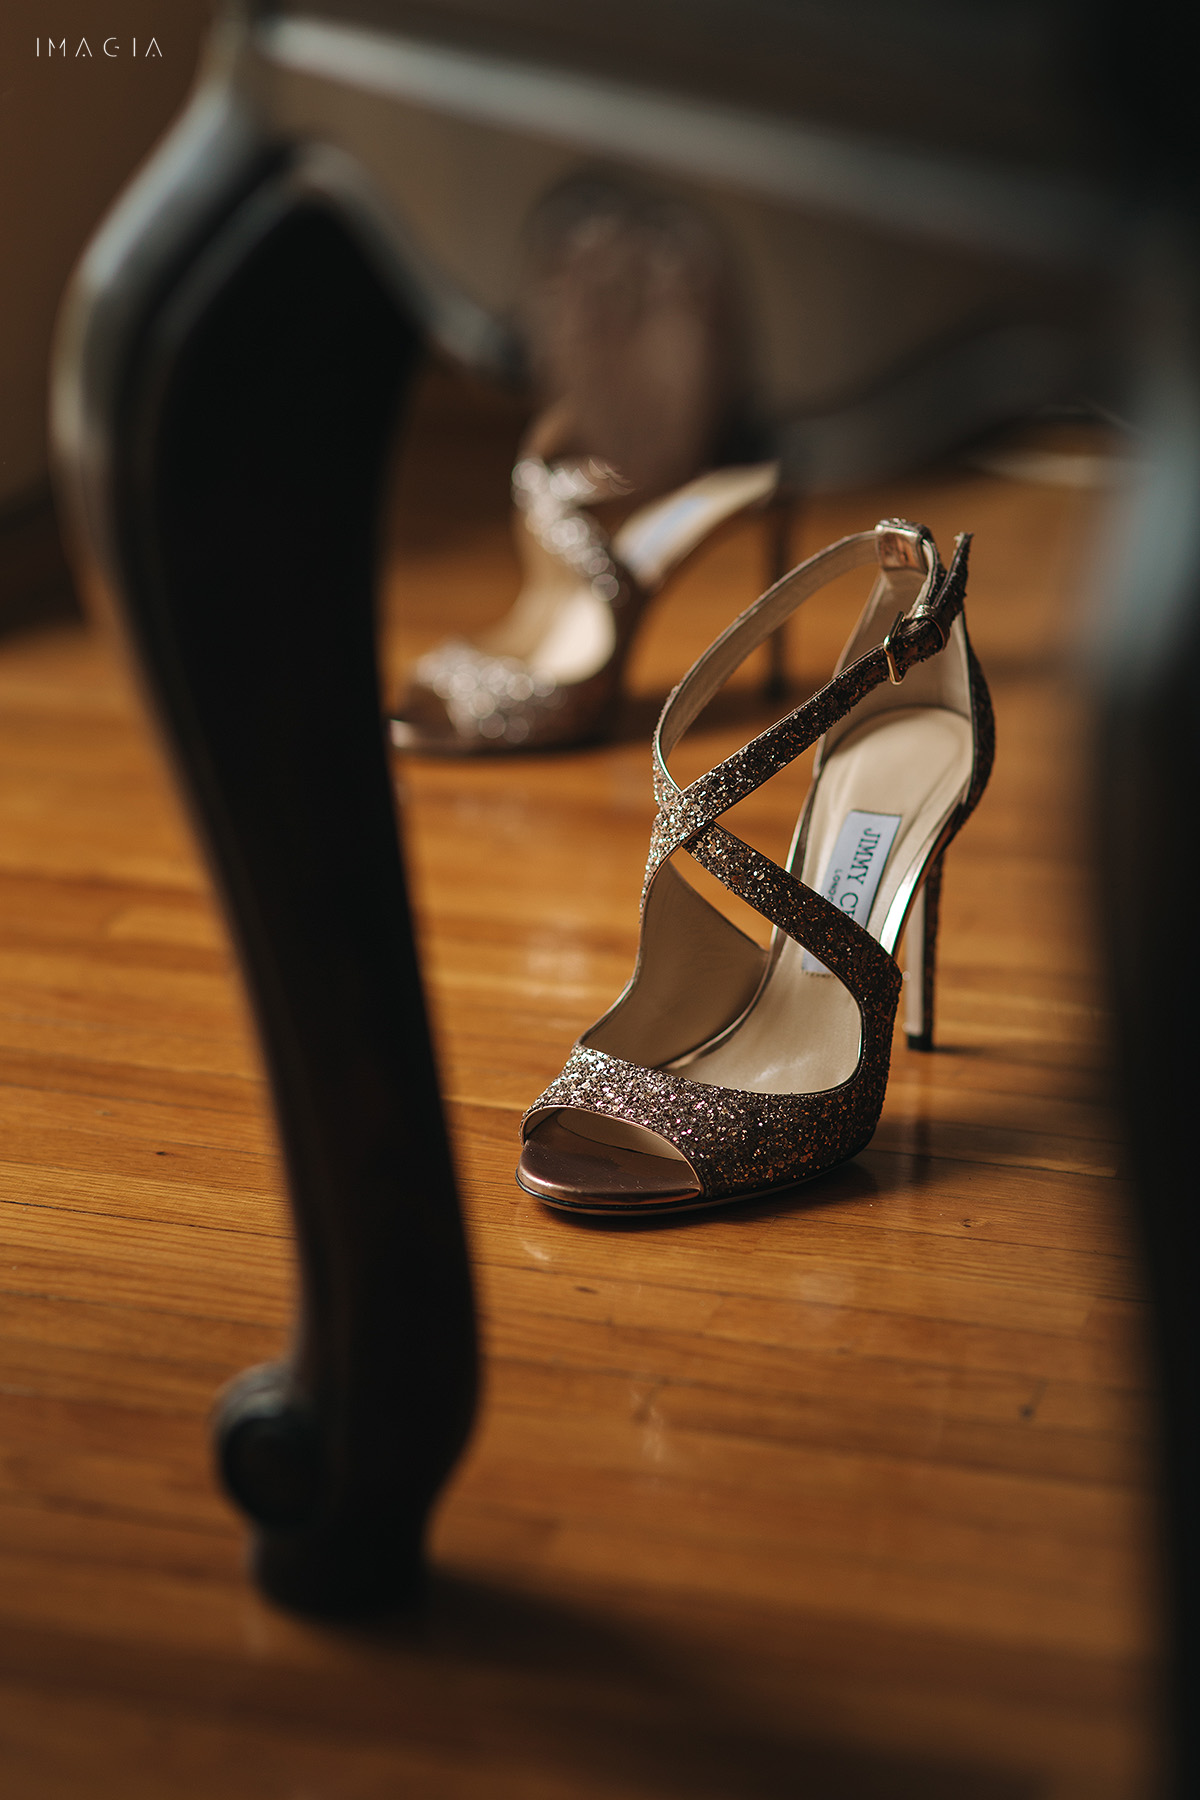 Pantofi de nunta Jimmy Choo la nunta in Satu Mare fotografiata de IMAGIA